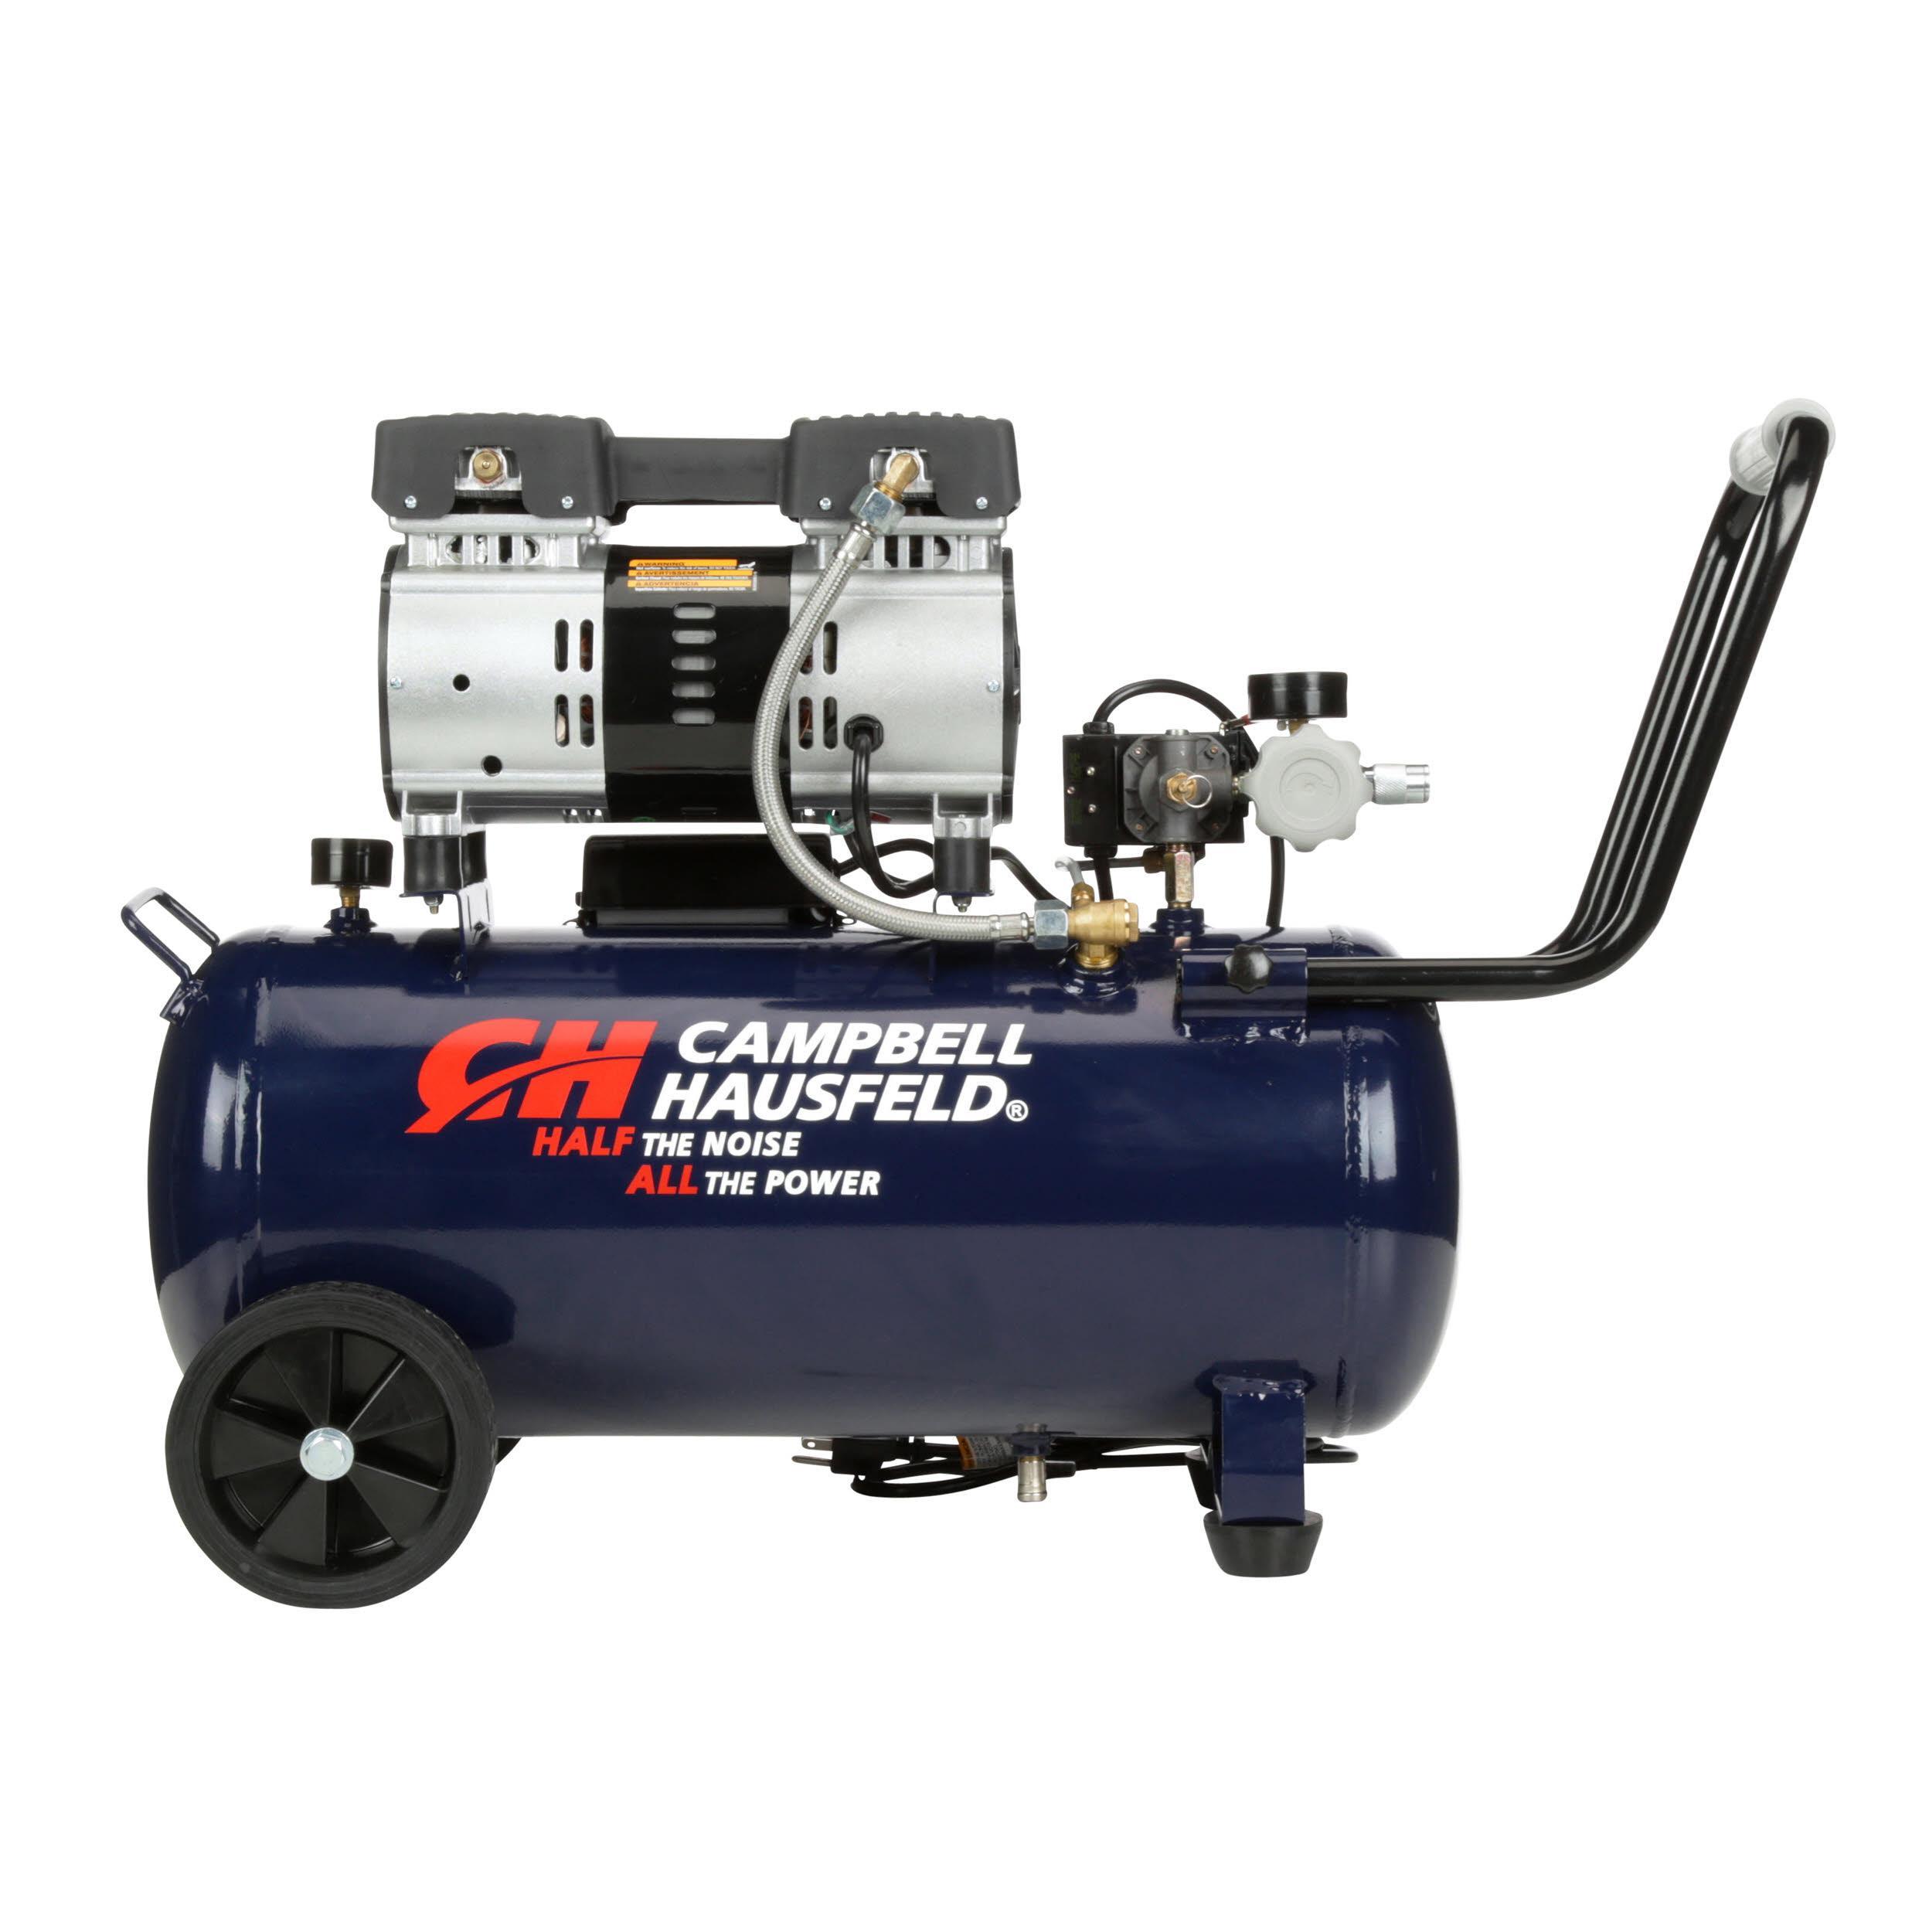 Quiet Air Compressor, 8 Gallon, Half the Noise, 4X the